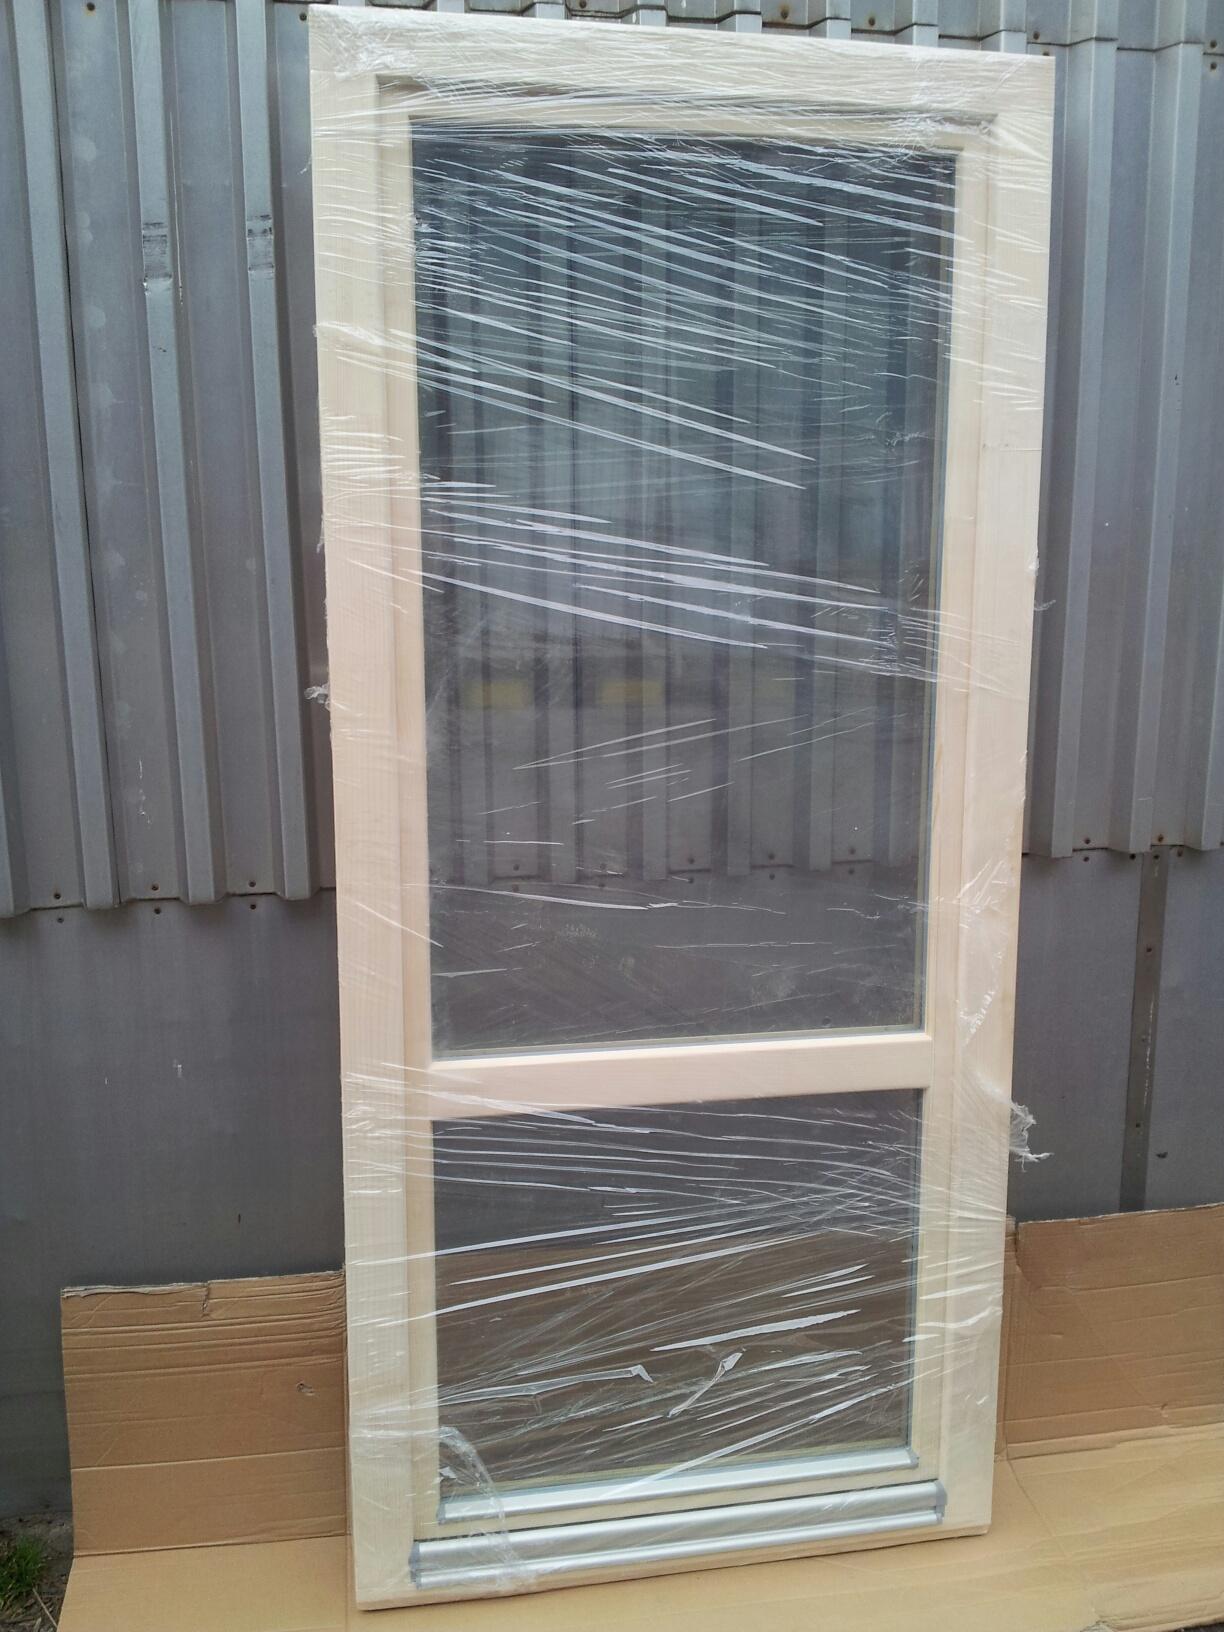 abc fenster holzbalkont r 90 cm breit x 200 cm hoch europrofil fichte. Black Bedroom Furniture Sets. Home Design Ideas